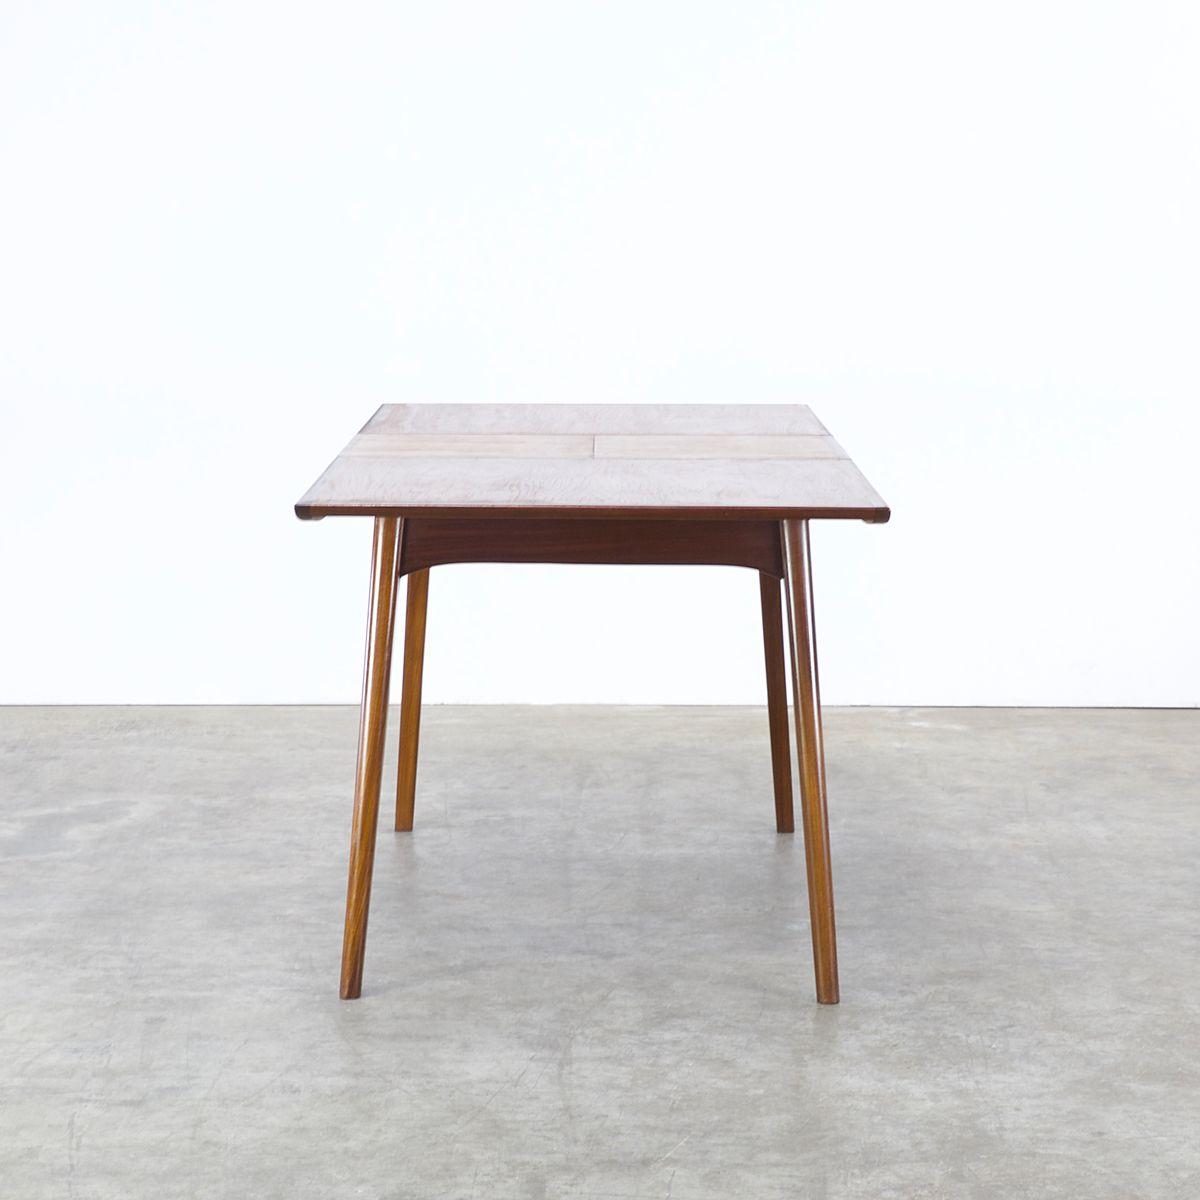 Table de salle manger rallonge par louis van teeffelen for Salle a manger 1960